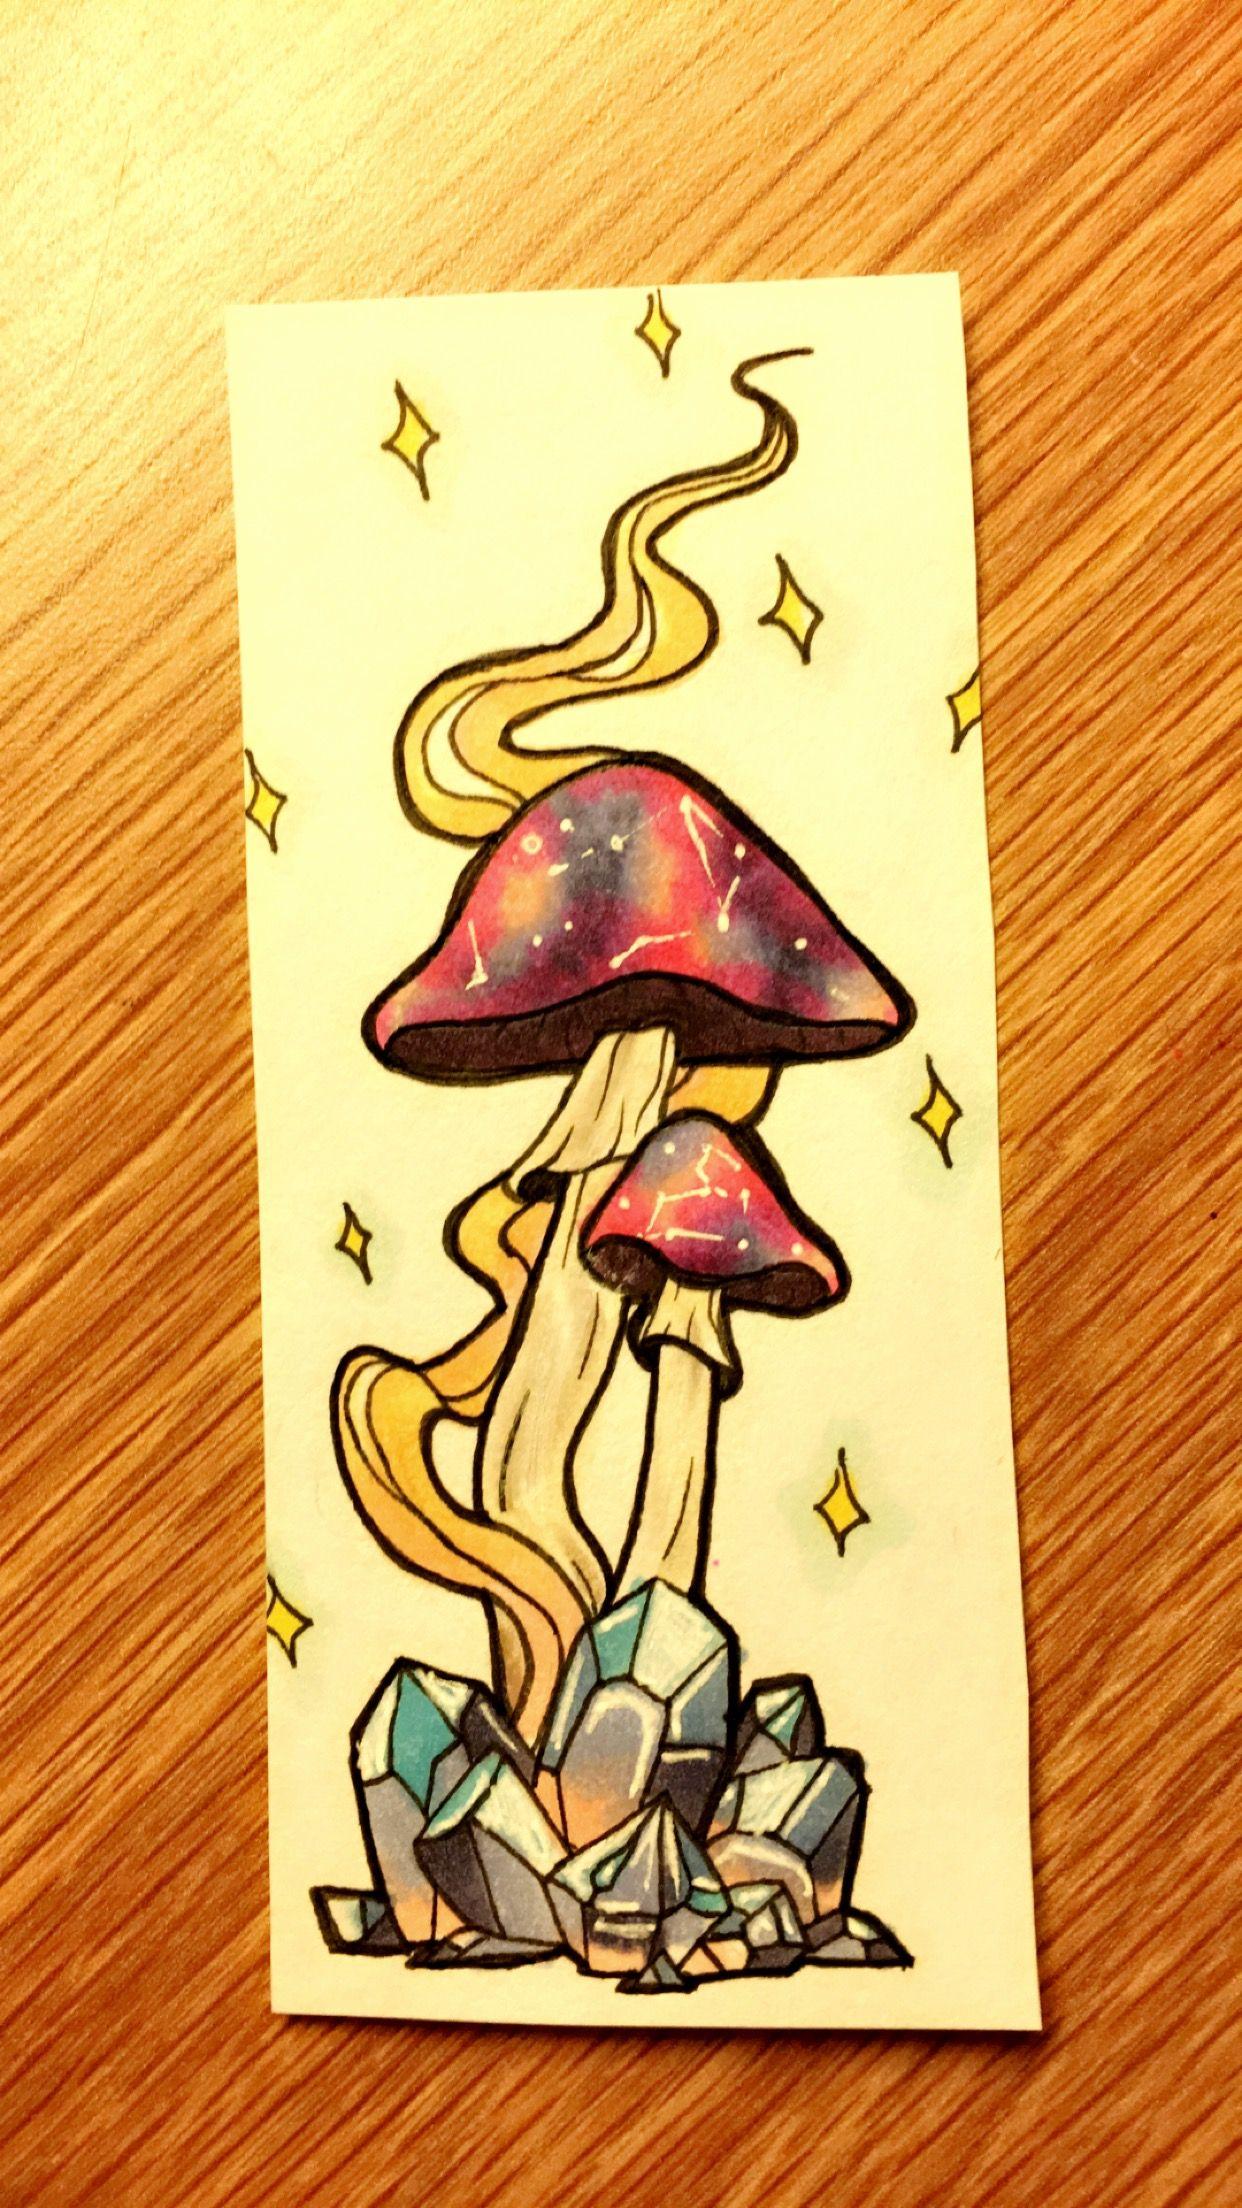 Pin by Sydney Dizick on Art Art, Trippy, Stickers